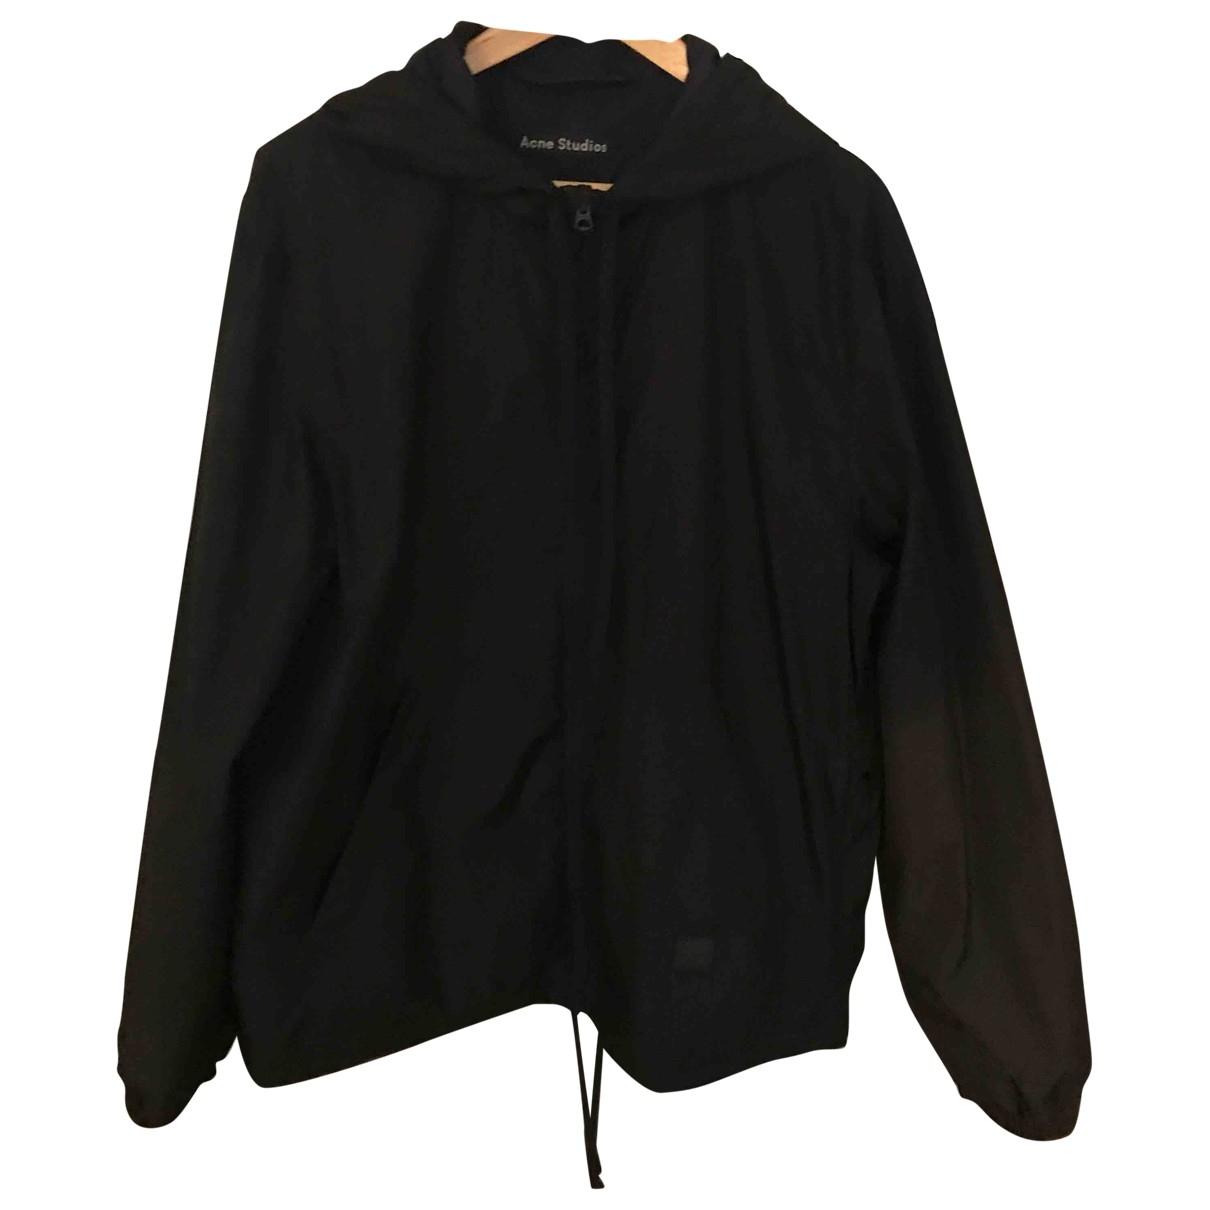 Acne Studios \N Black jacket  for Men L International